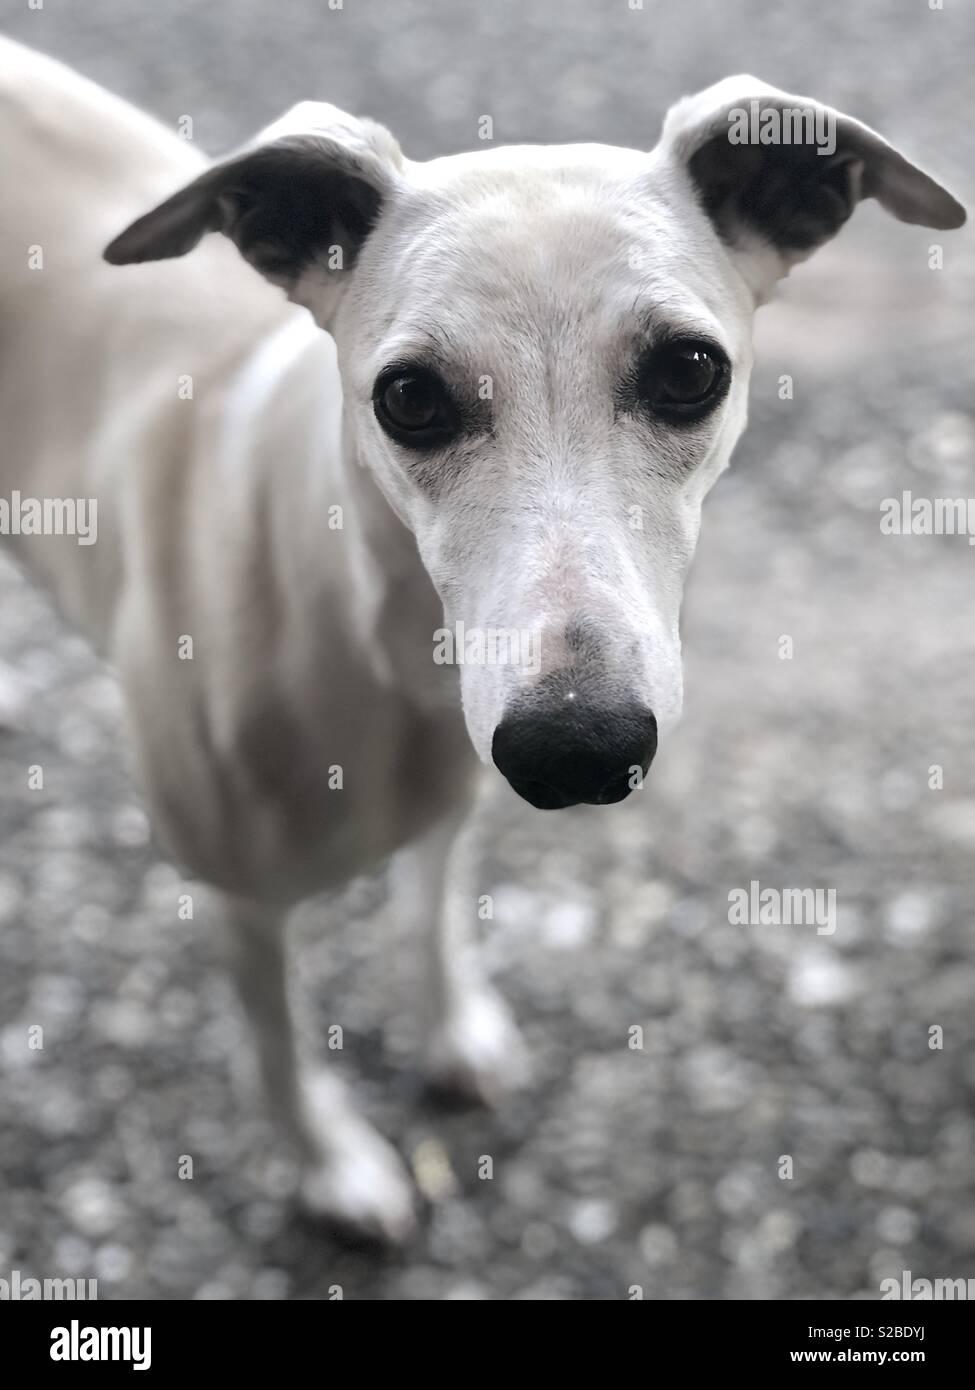 3f0cf126b4b19 Cute Whippet dog portrait Stock Photo  311268374 - Alamy